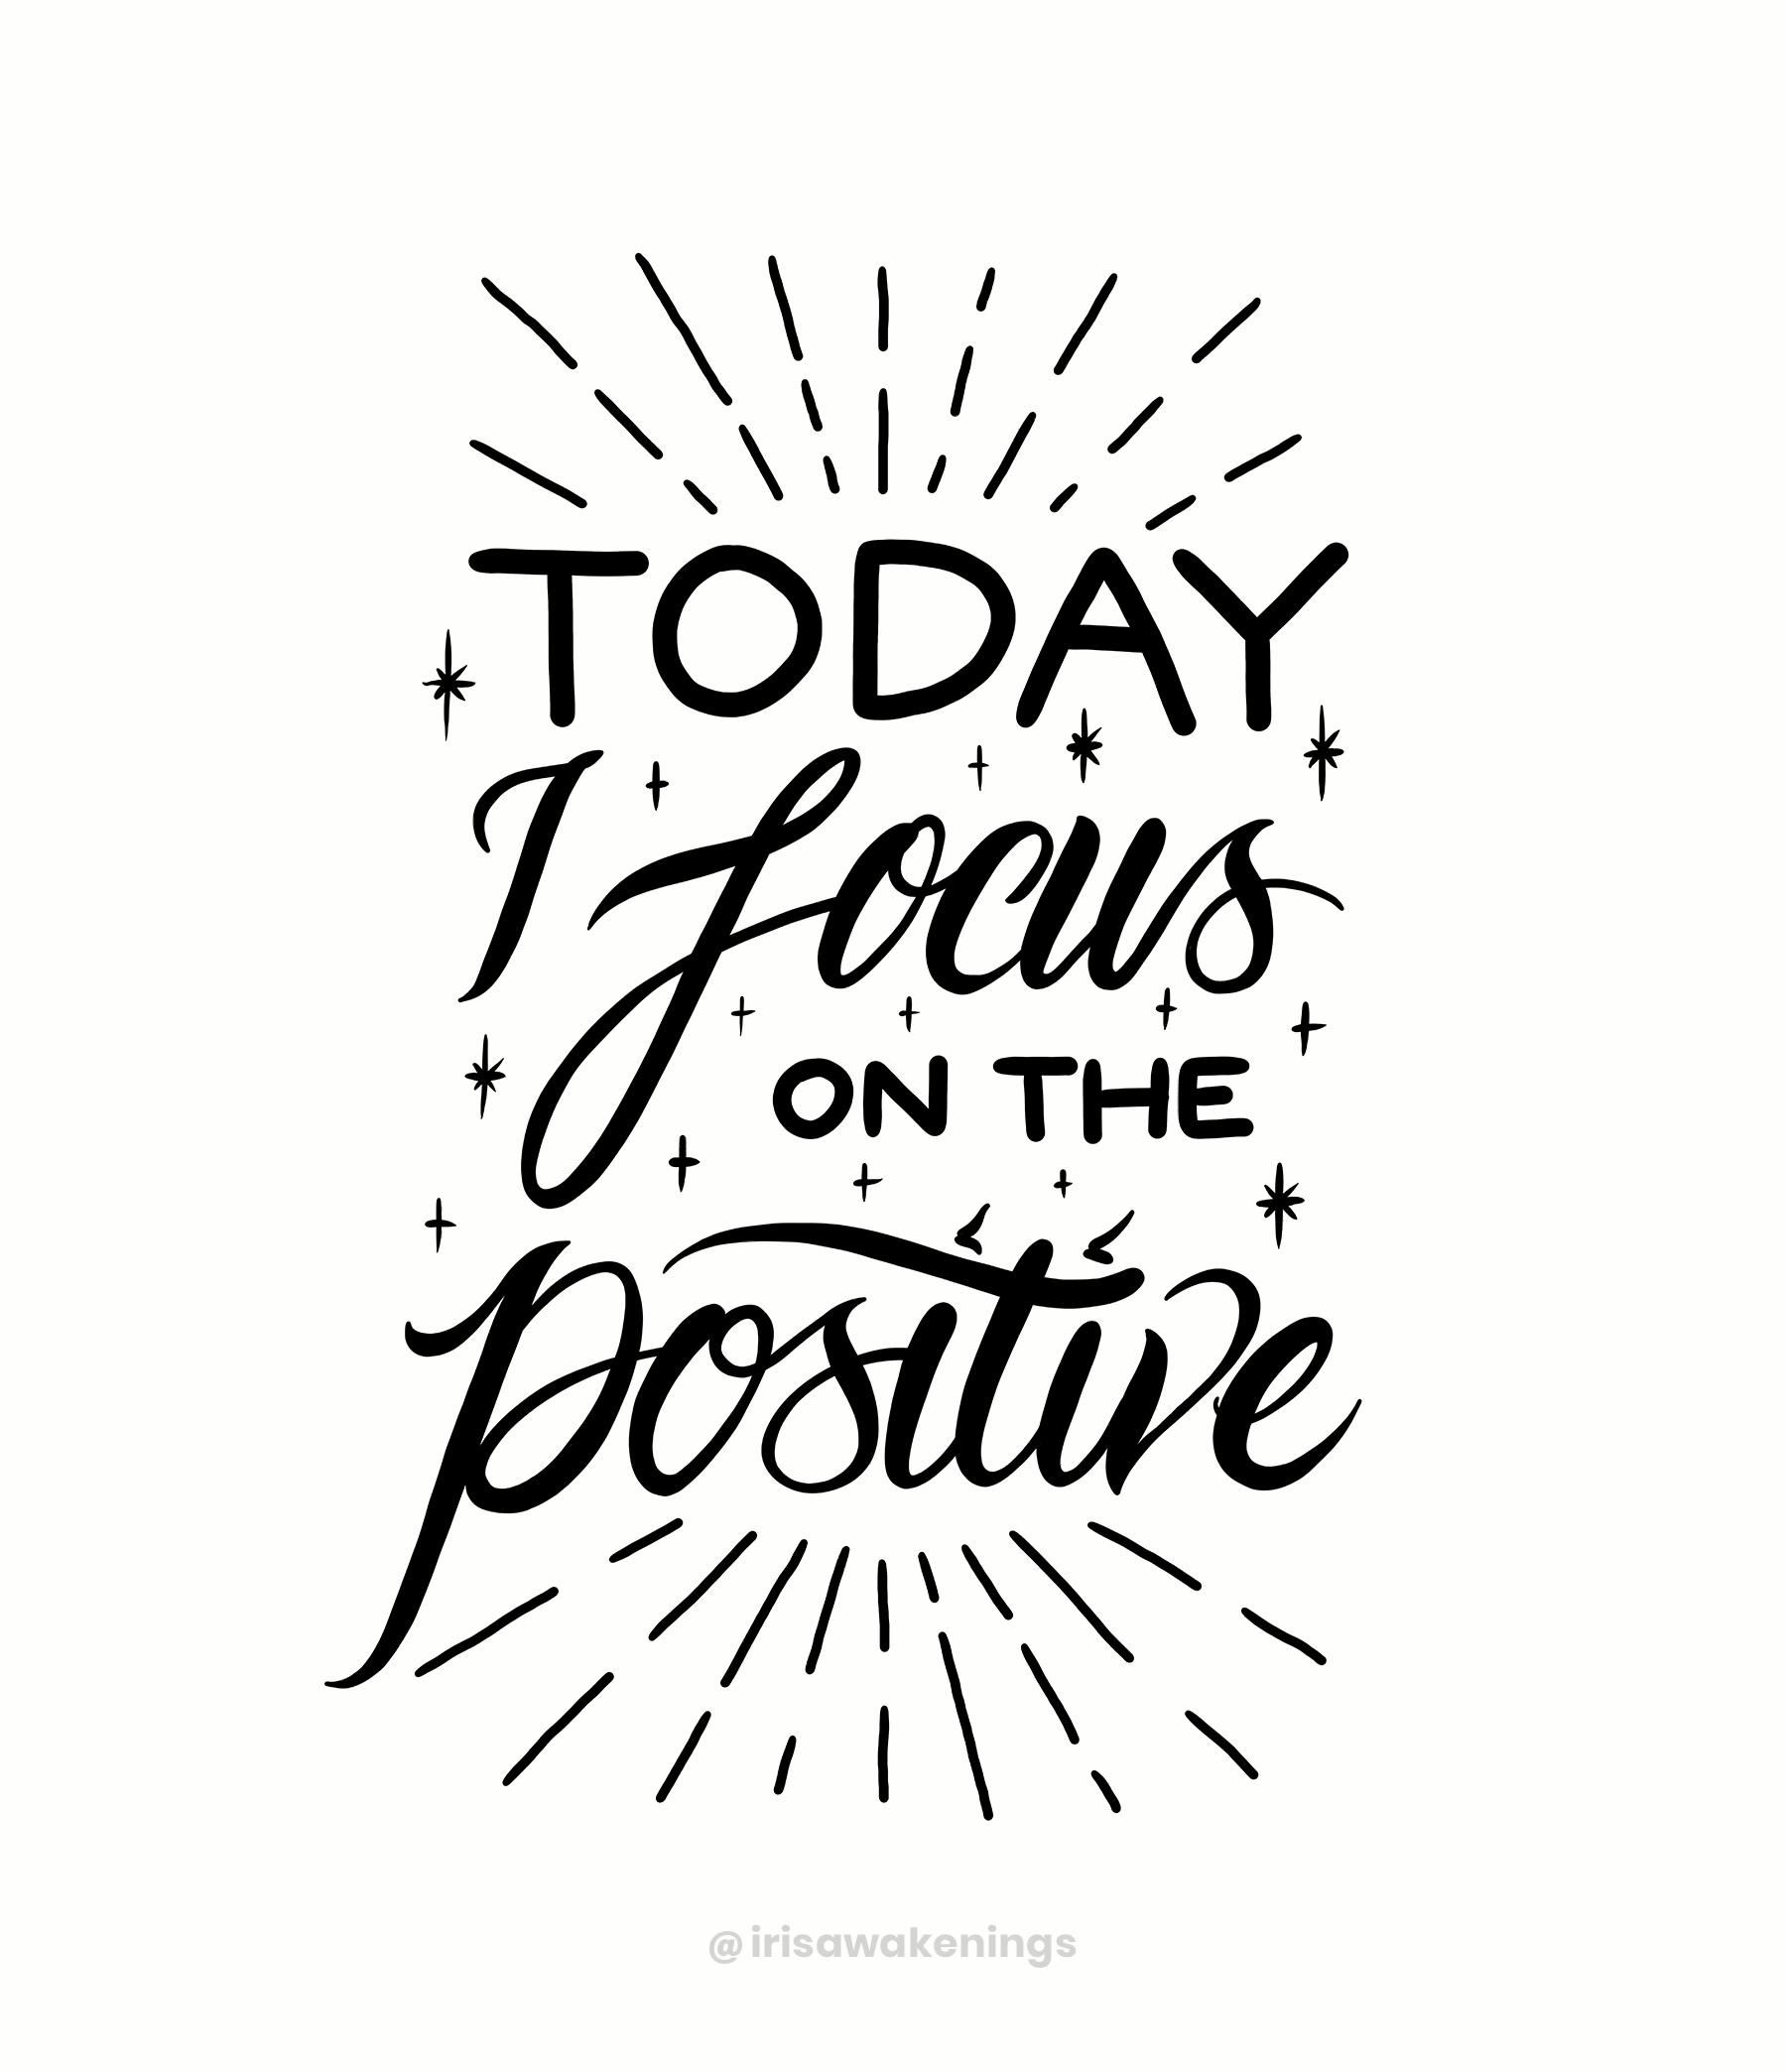 I Focus On The Positive Print | Positivity Art, Affirmations, Motivational Wall Art, Inspirational